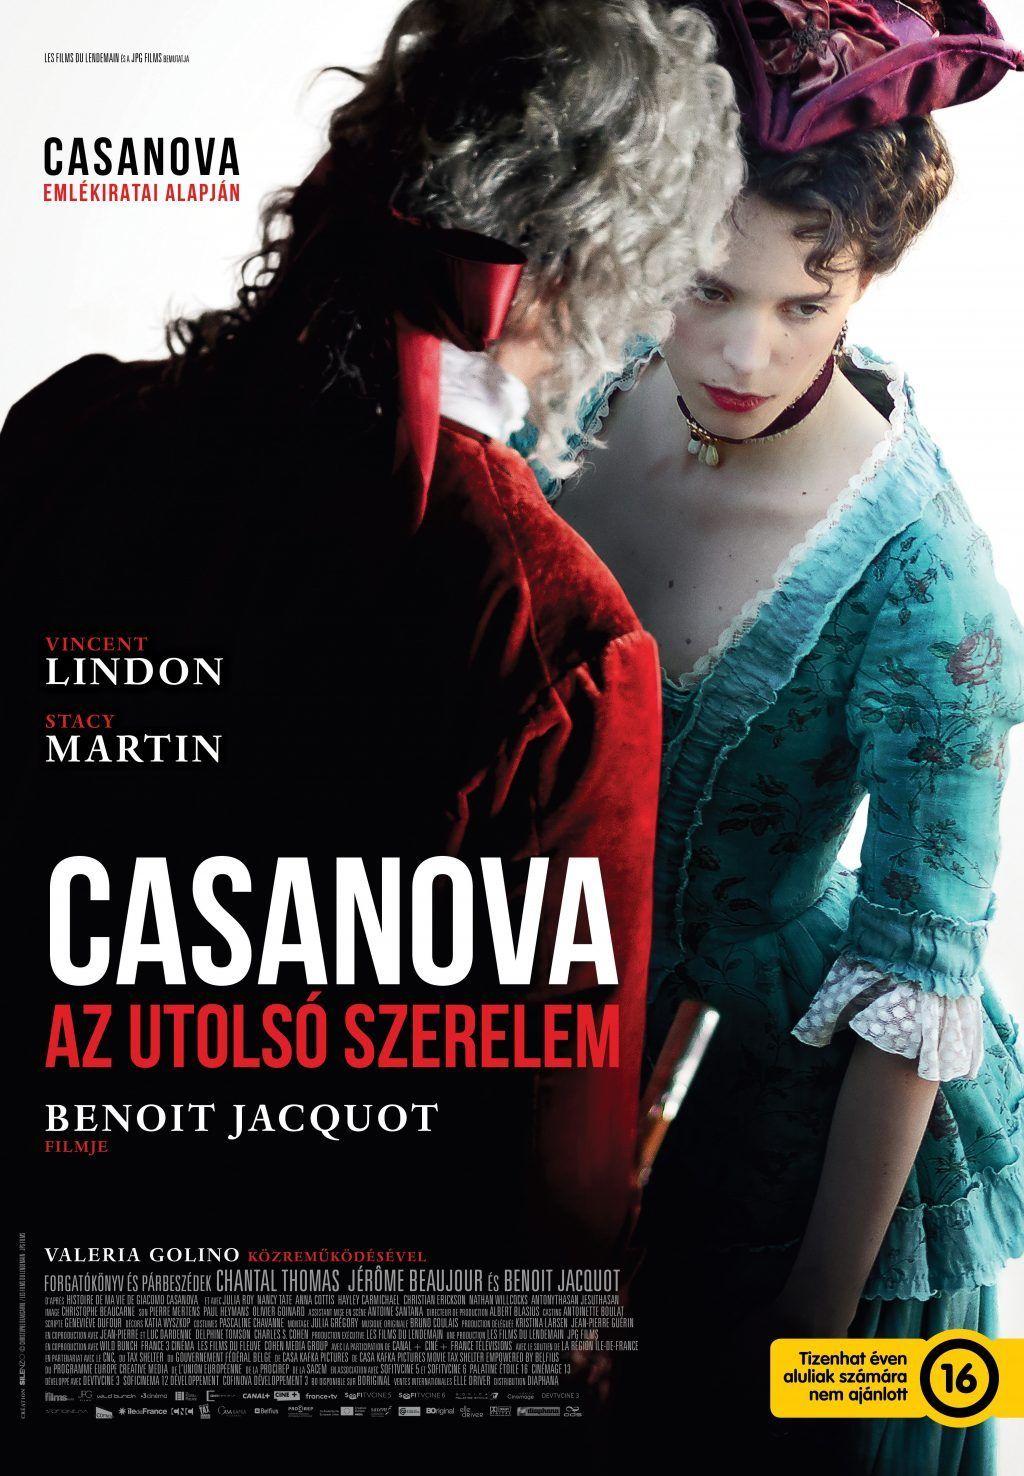 Casanova Az Utolso Szerelem Dernier Amour 2019 Film Stacy Martin Chantal Film